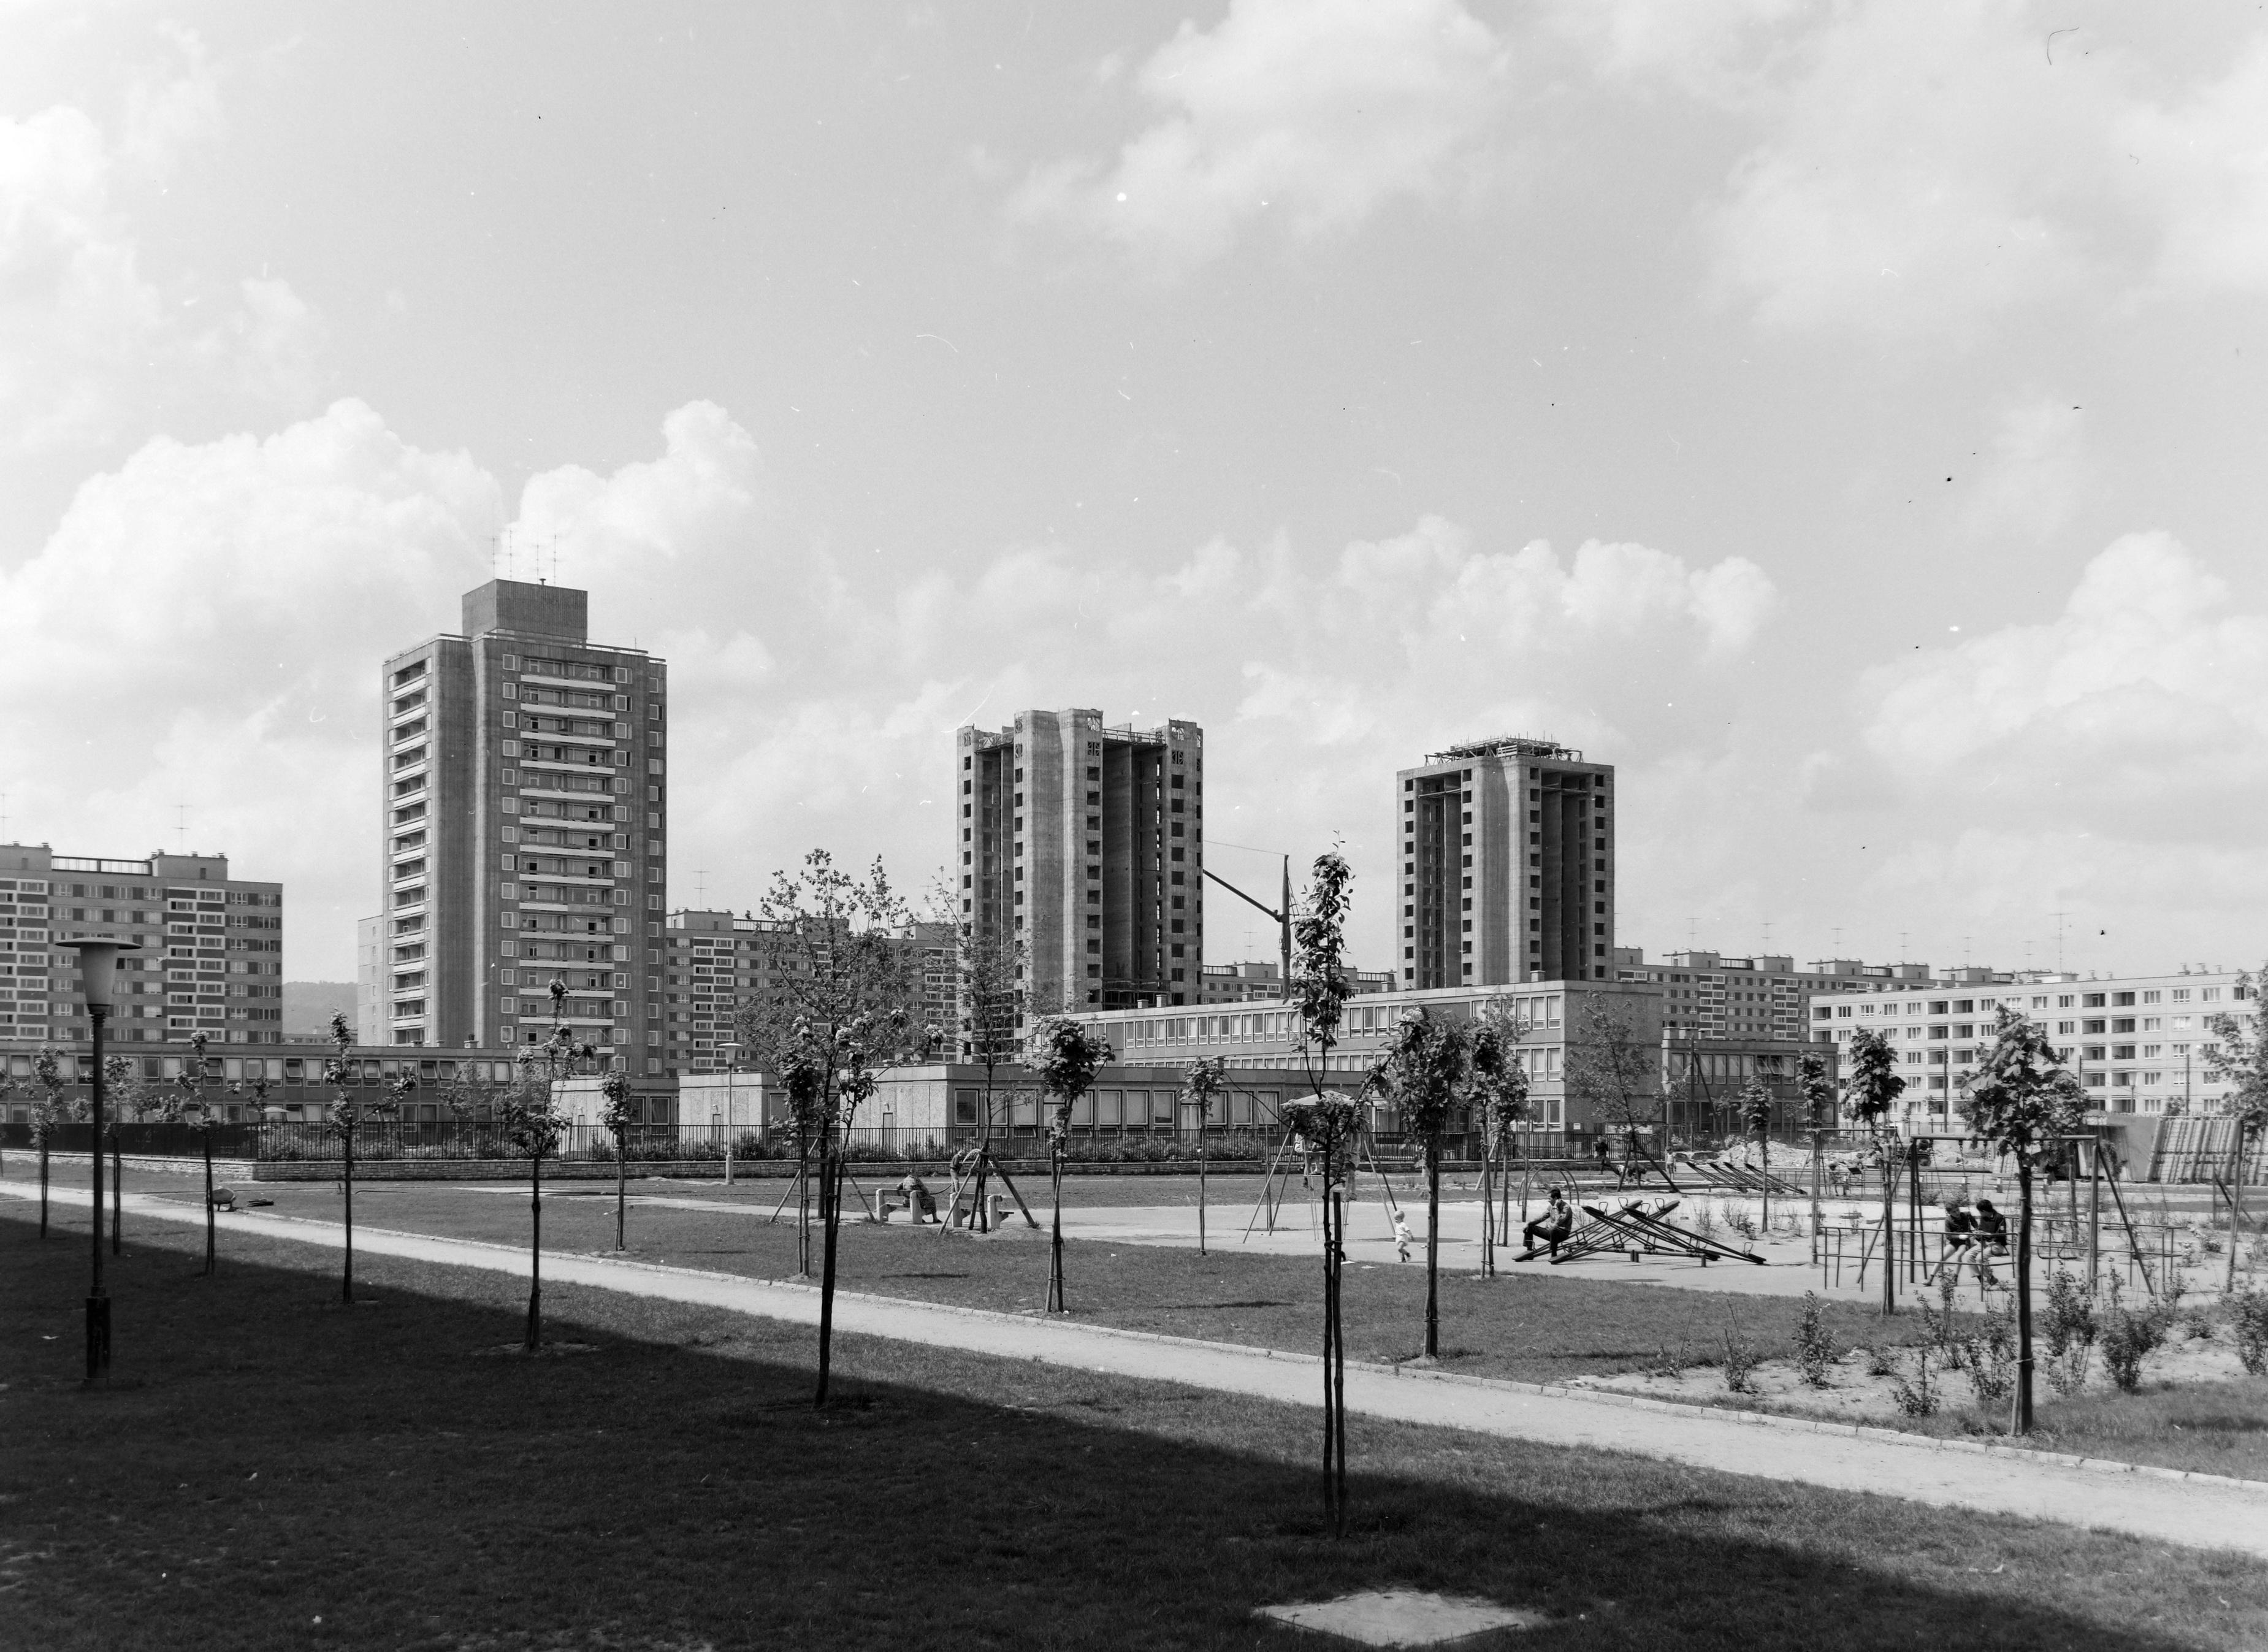 kelenfoldiltp-1969korul-fortepan_hu-208644-fofoto.jpg